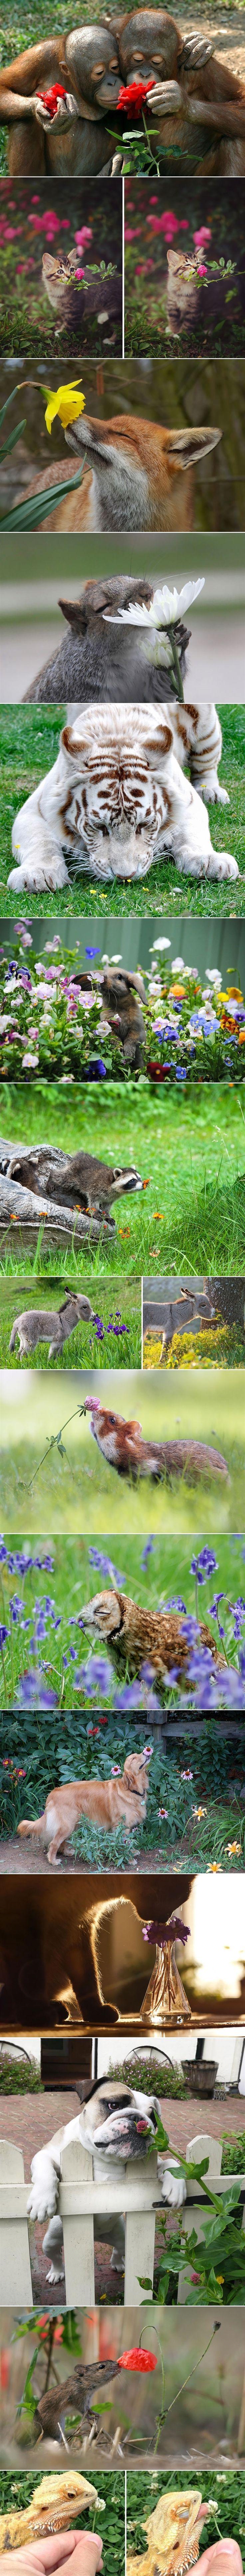 Funny cute animals